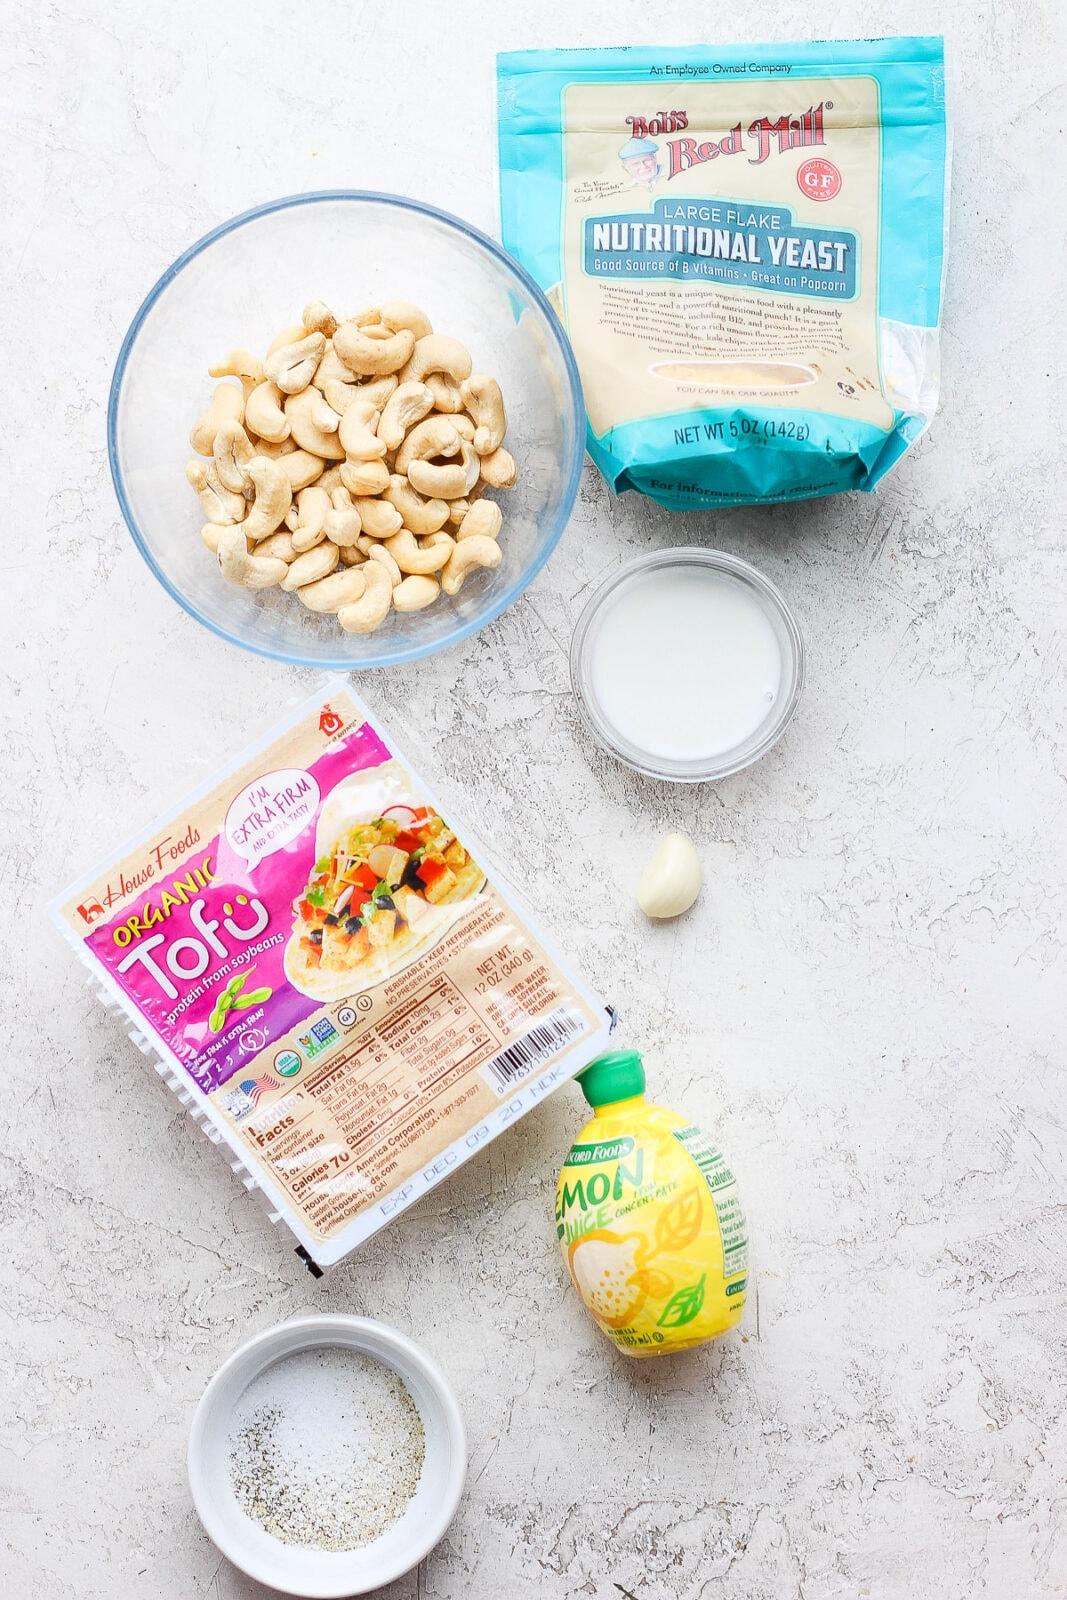 Image of ingredients needed for vegan ricotta.